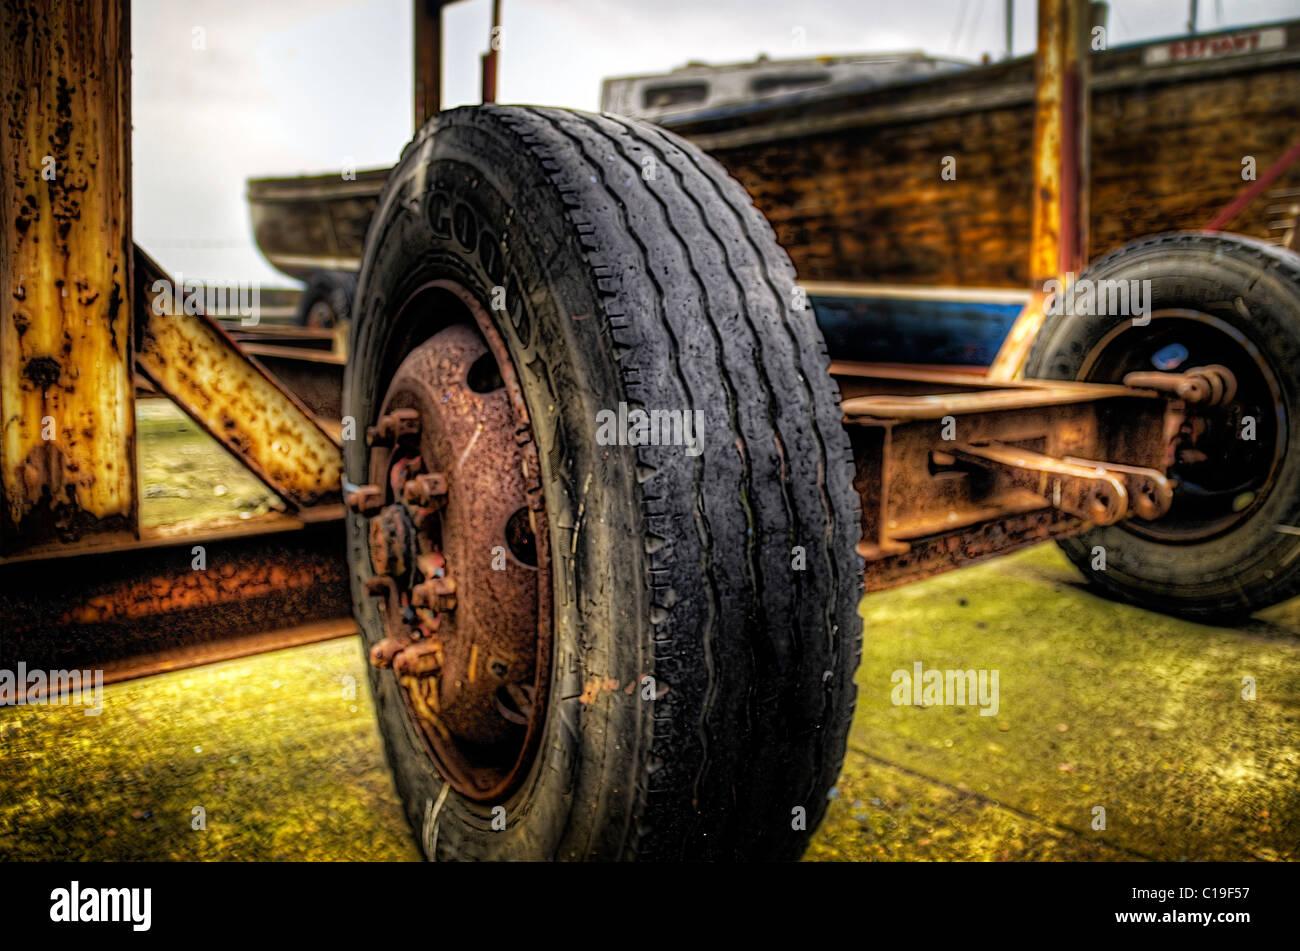 Old Trailer wheel rendered in high dynamic range format - HDR. - Stock Image